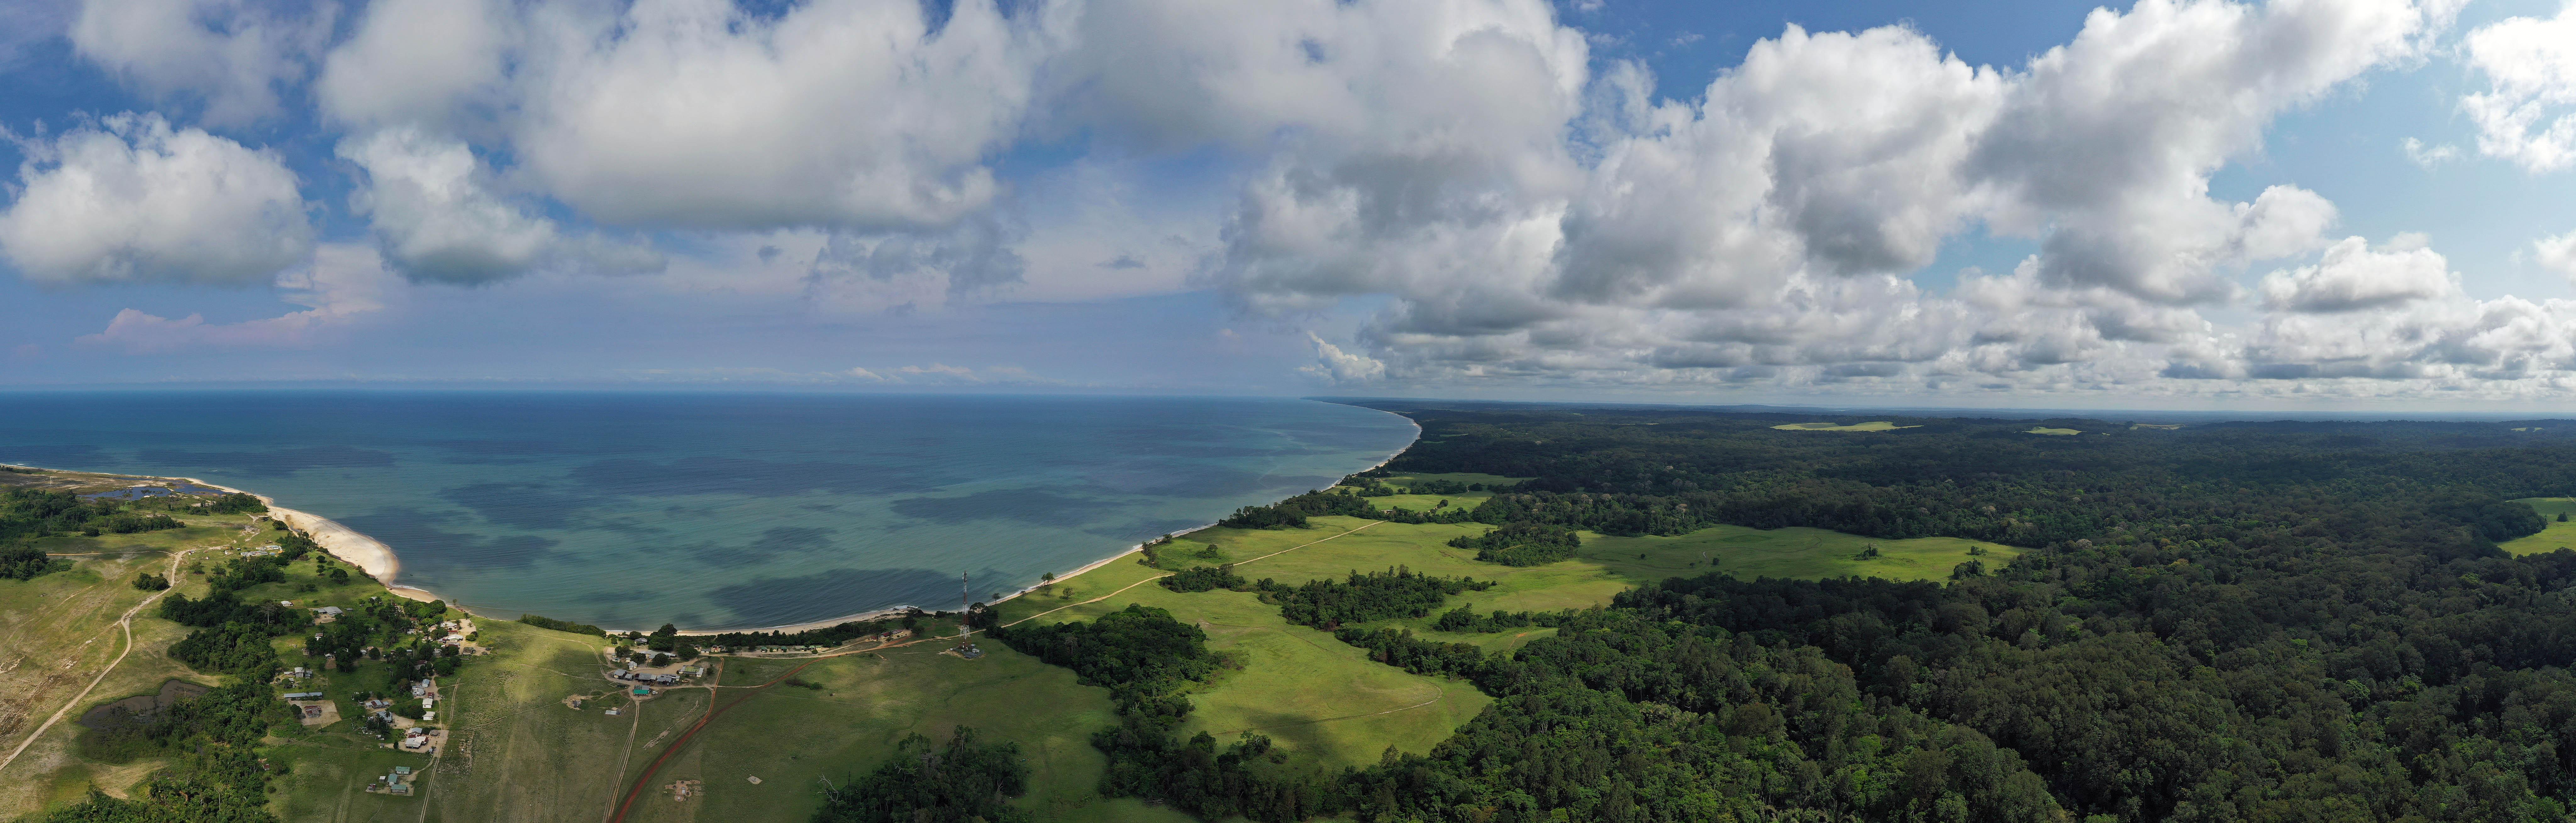 Gabon bay of Nyonié – Gabon